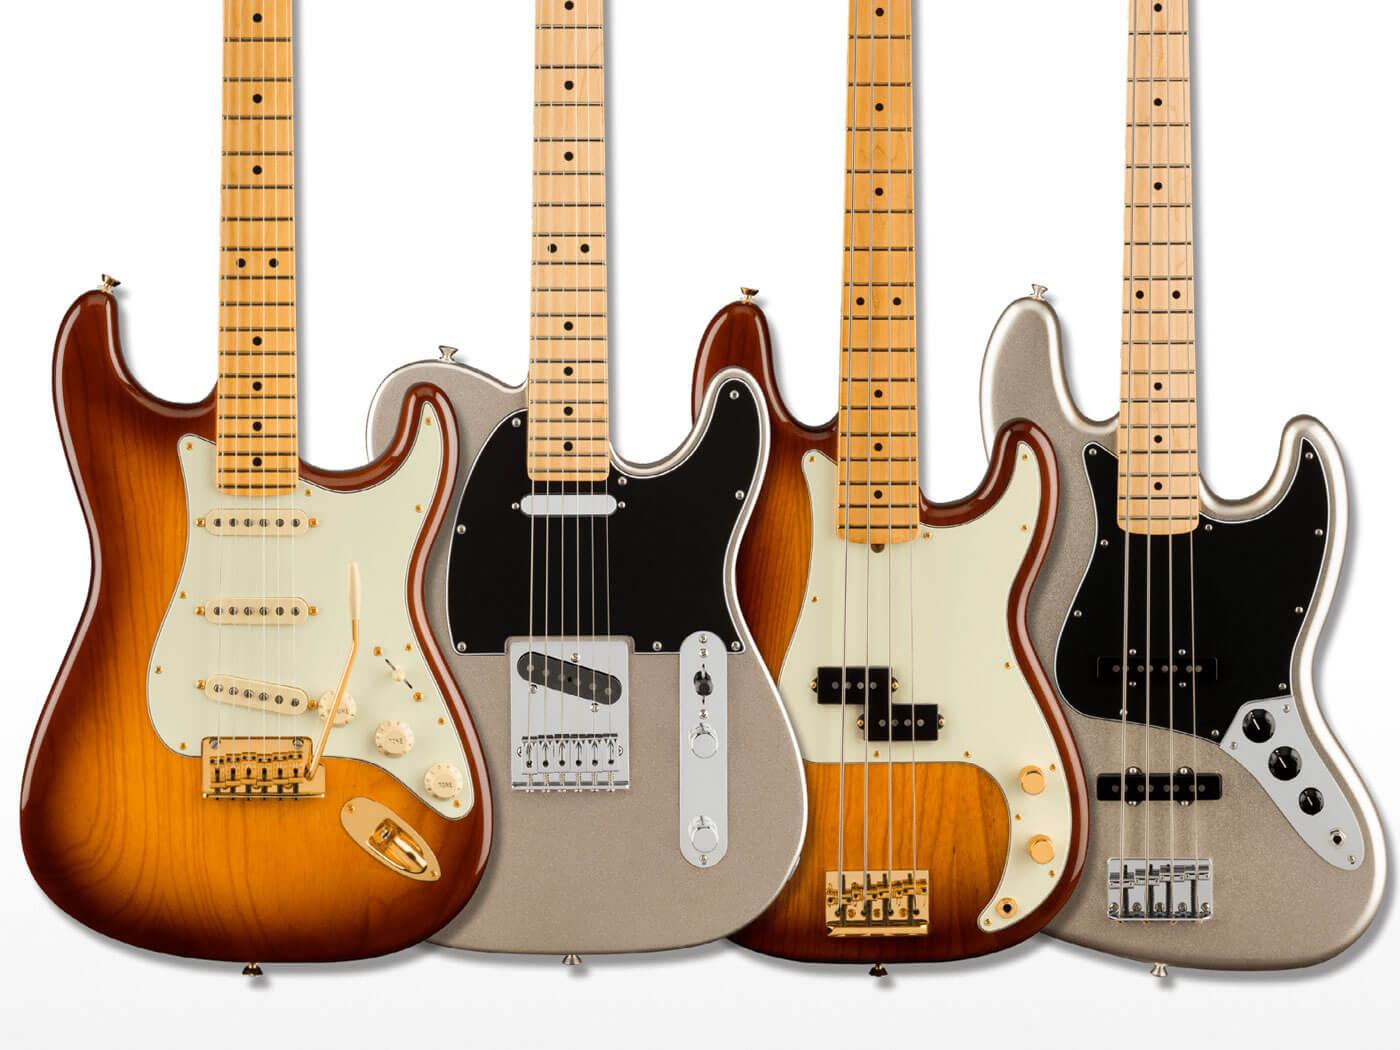 Fender's 75th anniversary models